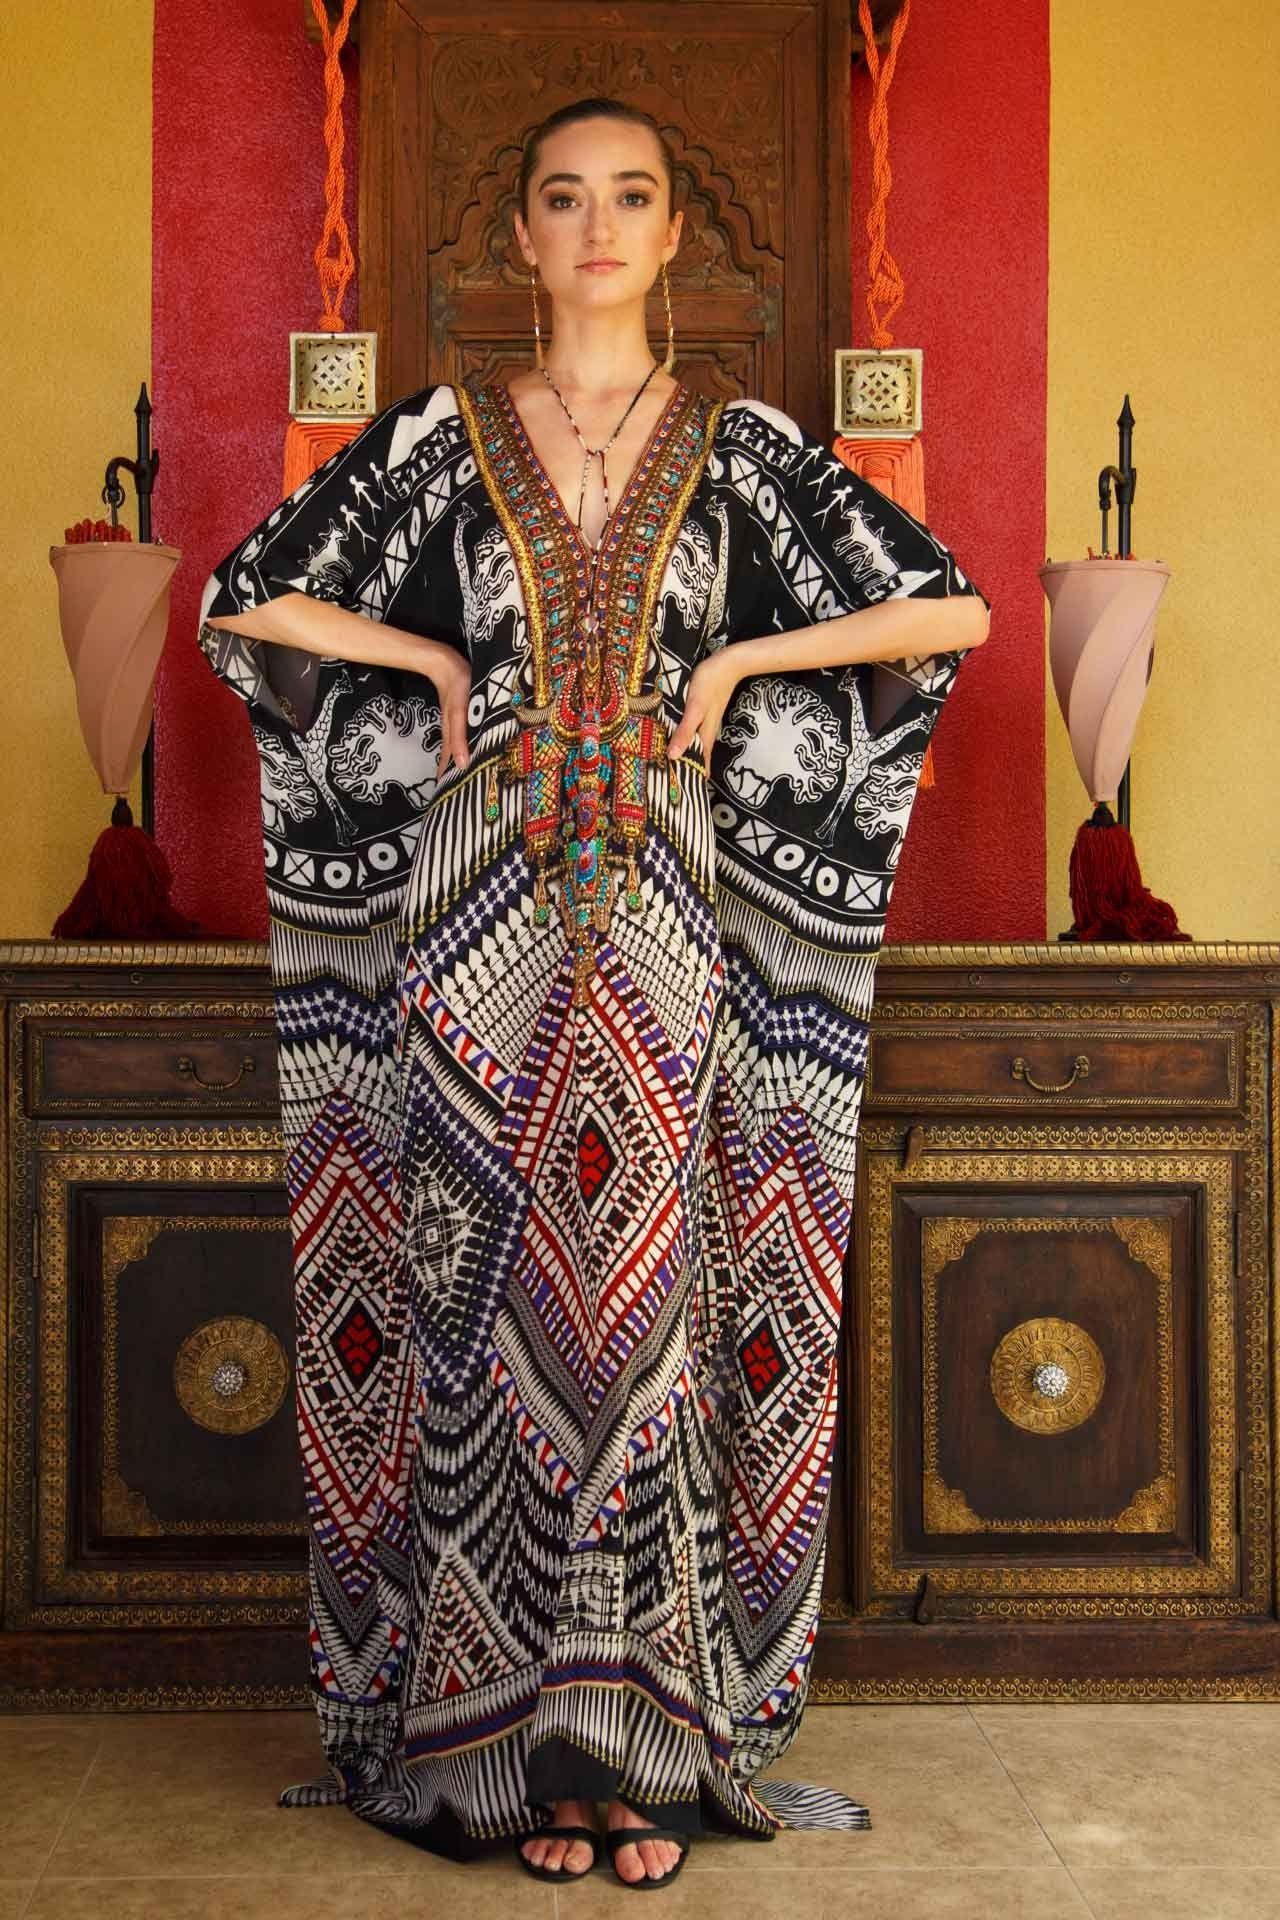 d66a21e35d4 Black and White African Print Kaftan Dress in 2019